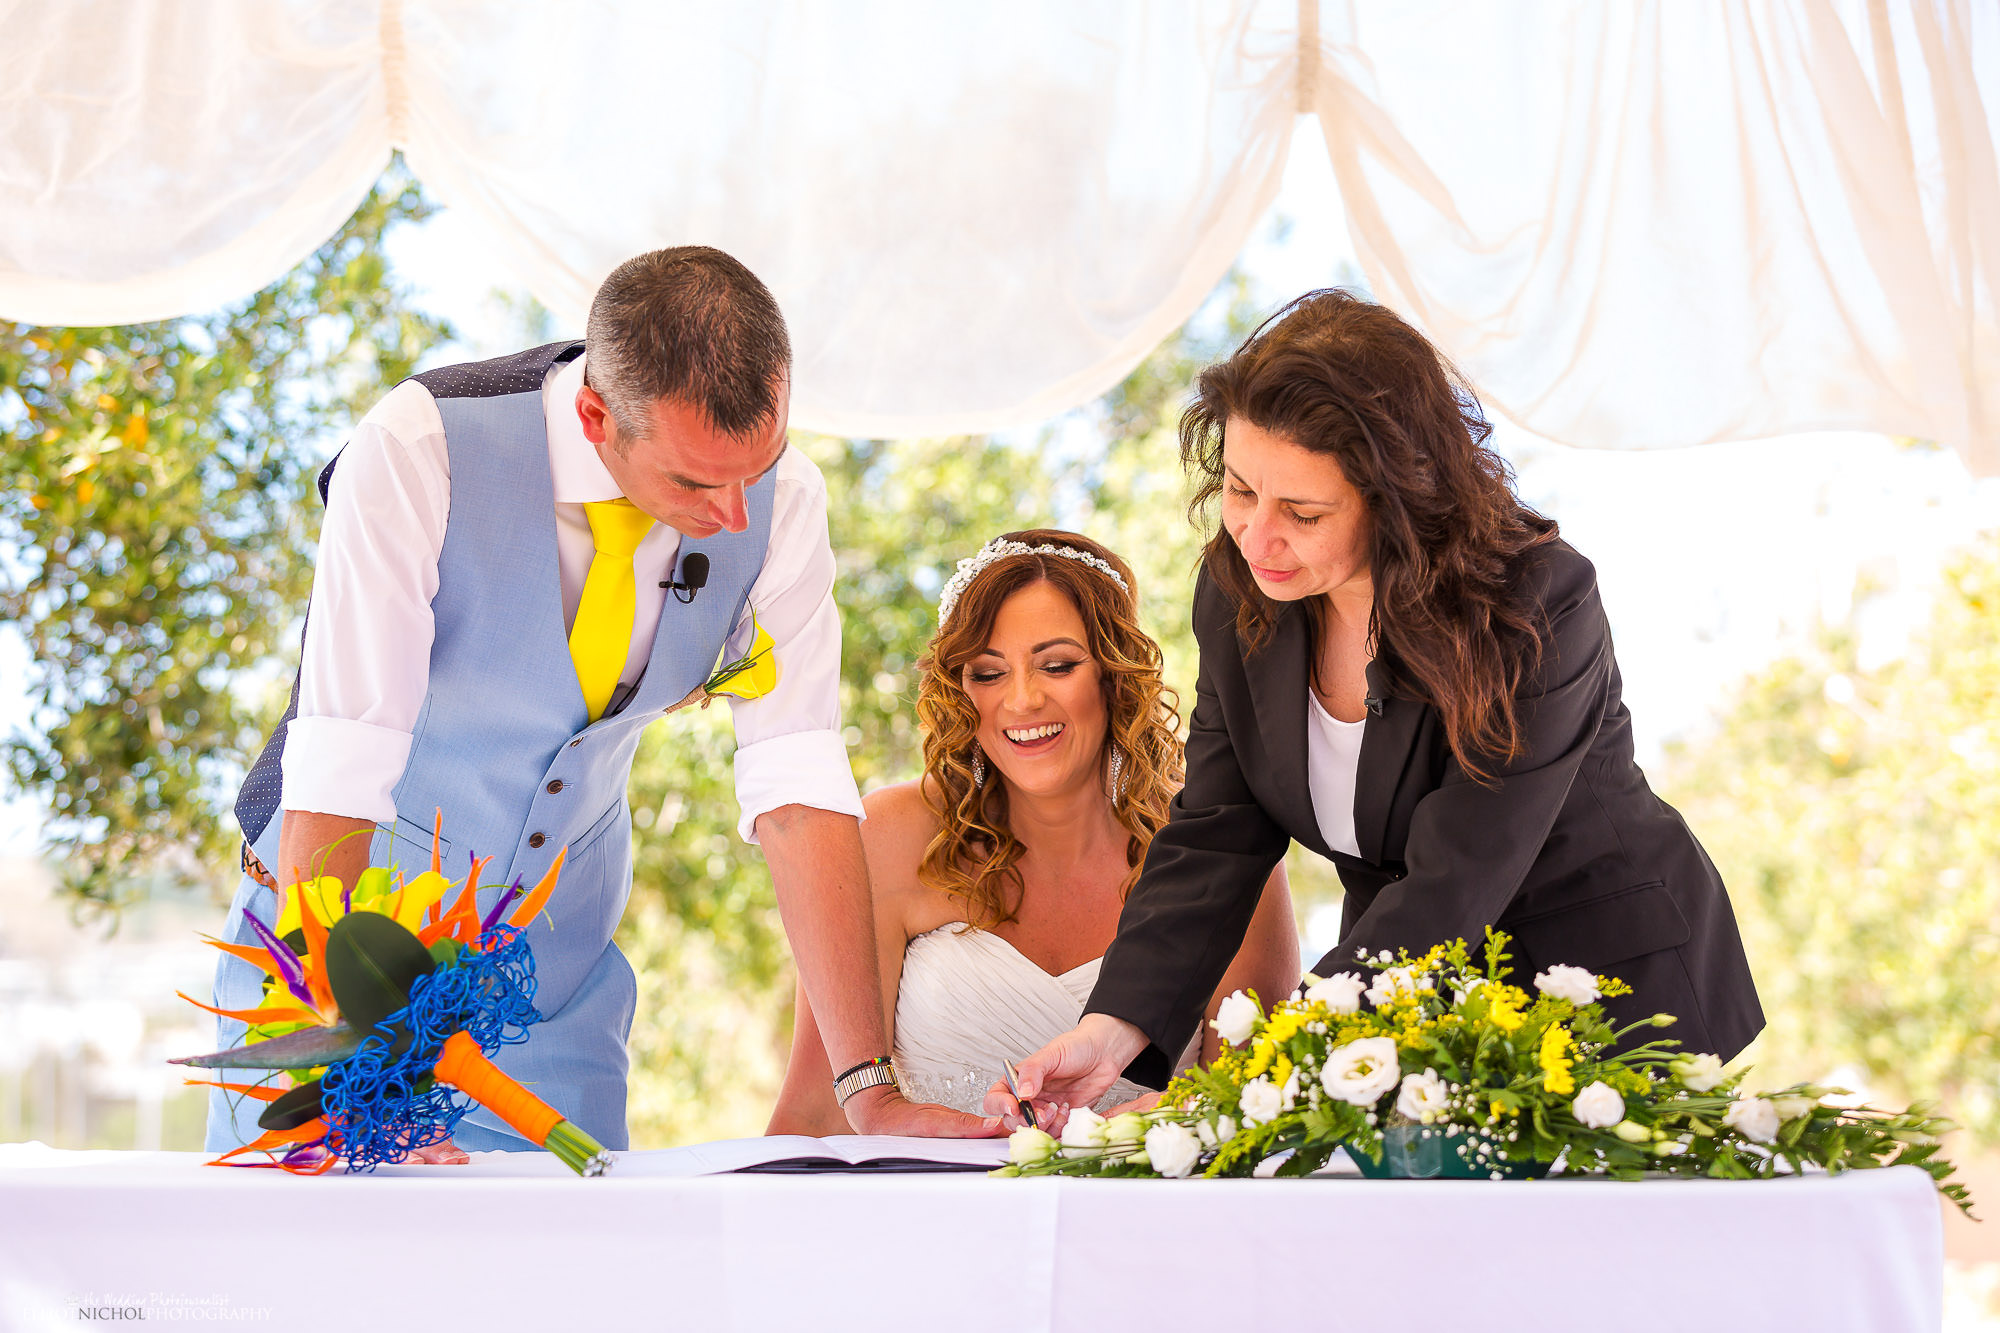 registrar-signing-marriage-certificate-destination-wedding